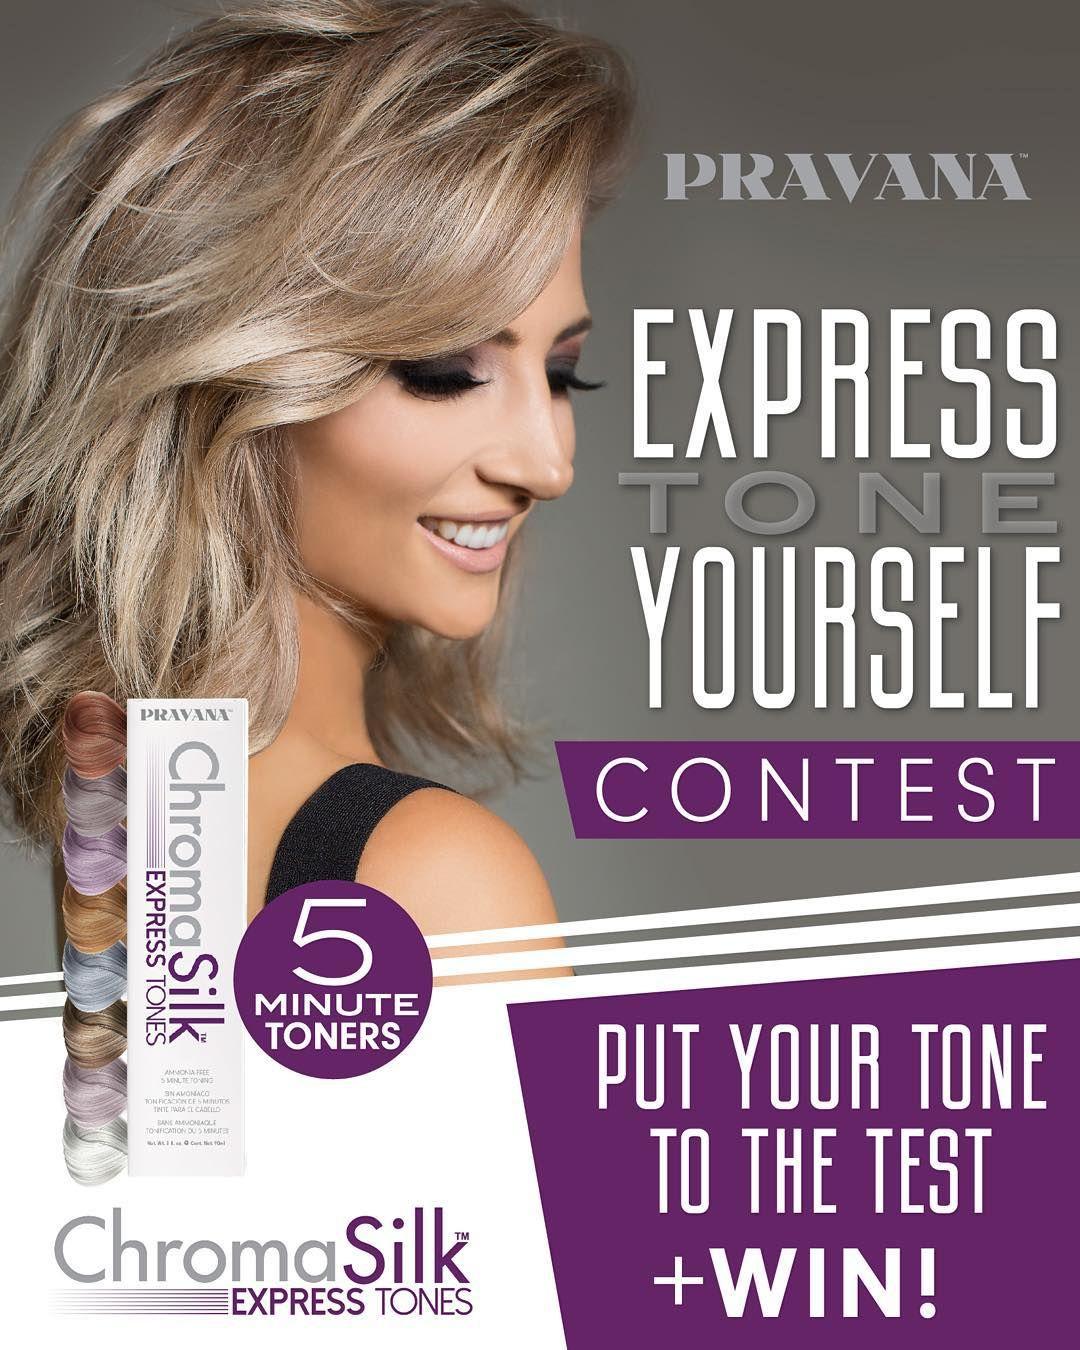 Last chance express tone yourself post your best transformation post your best transformation using chromasilk express tones pravana hair colorhair nvjuhfo Images